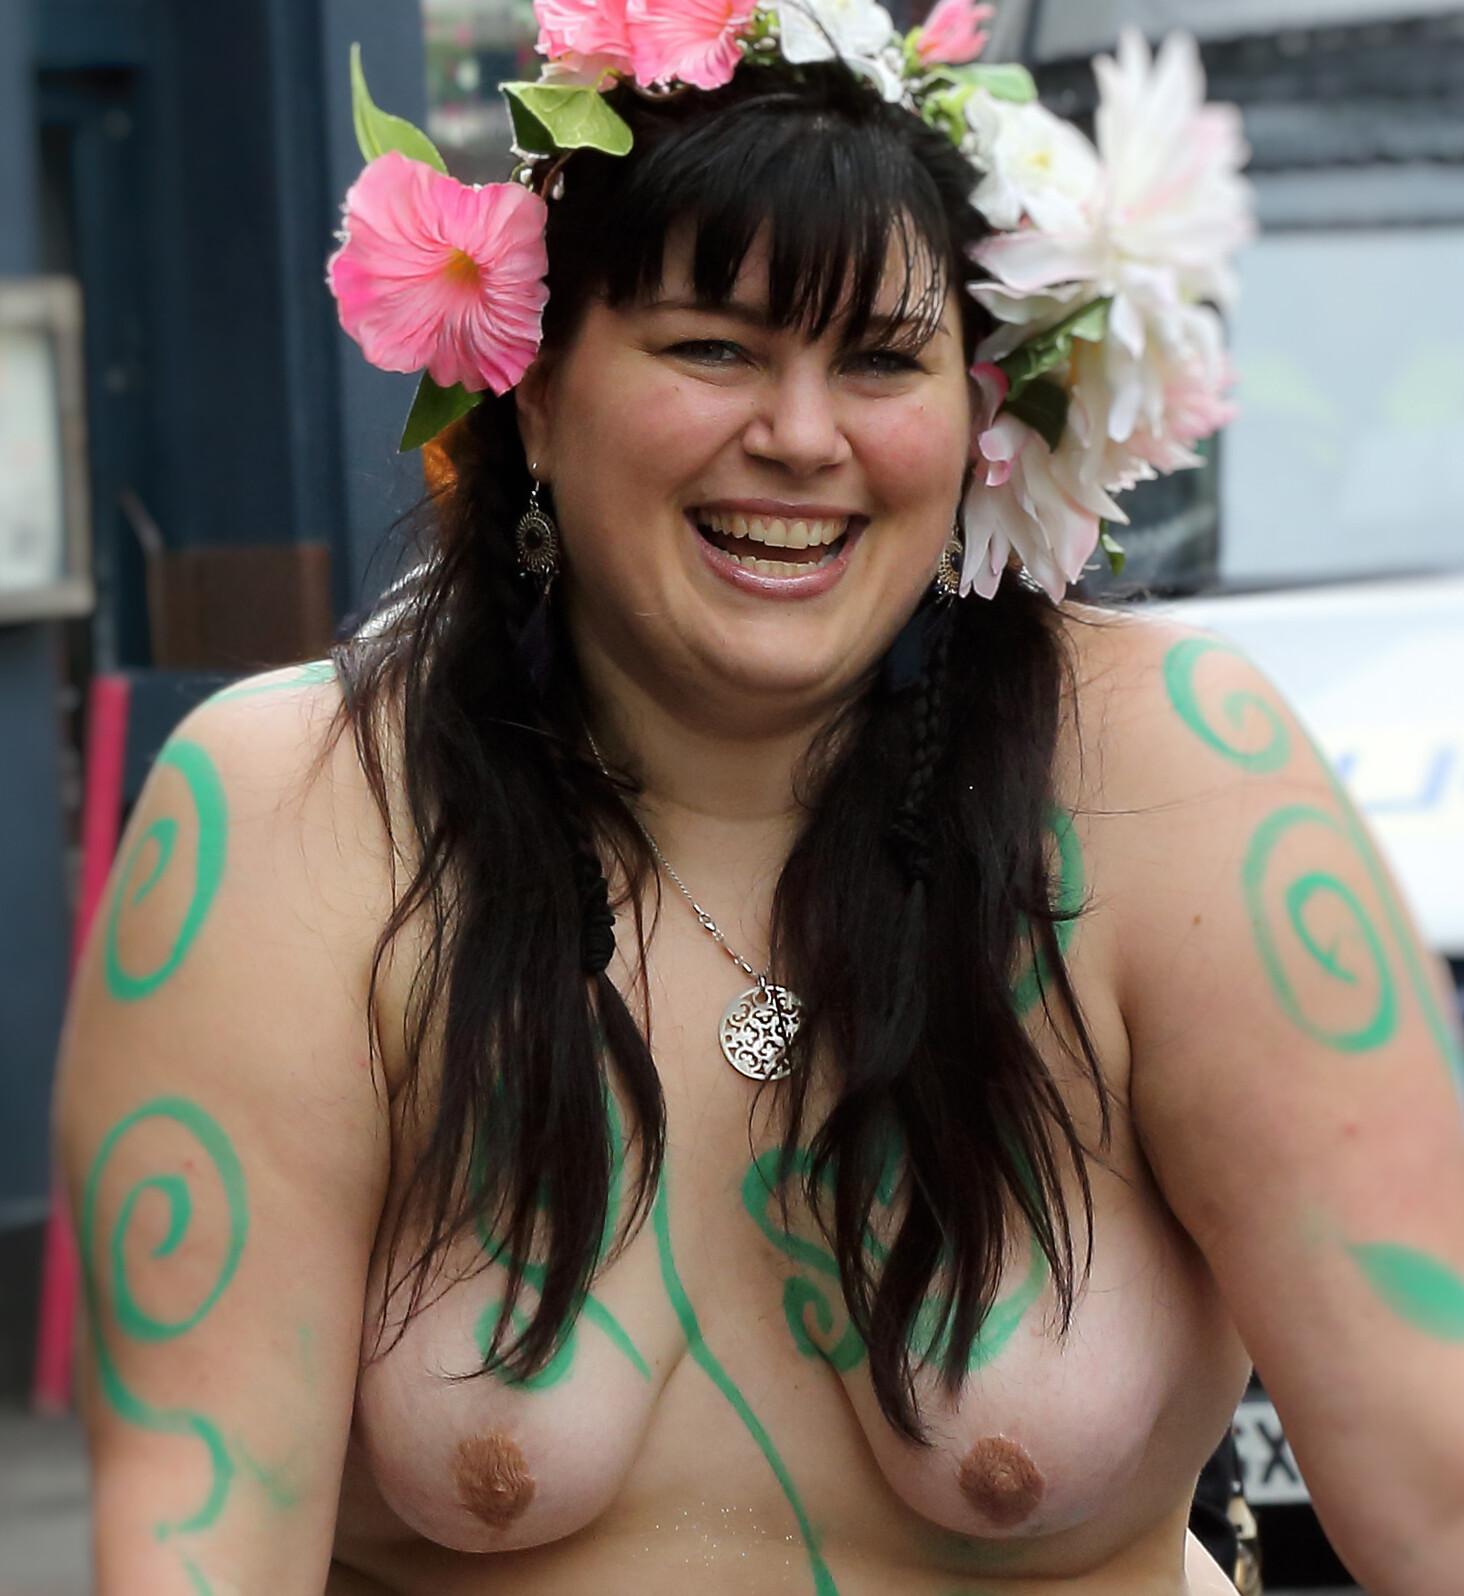 Tits bare FridaMom Shares